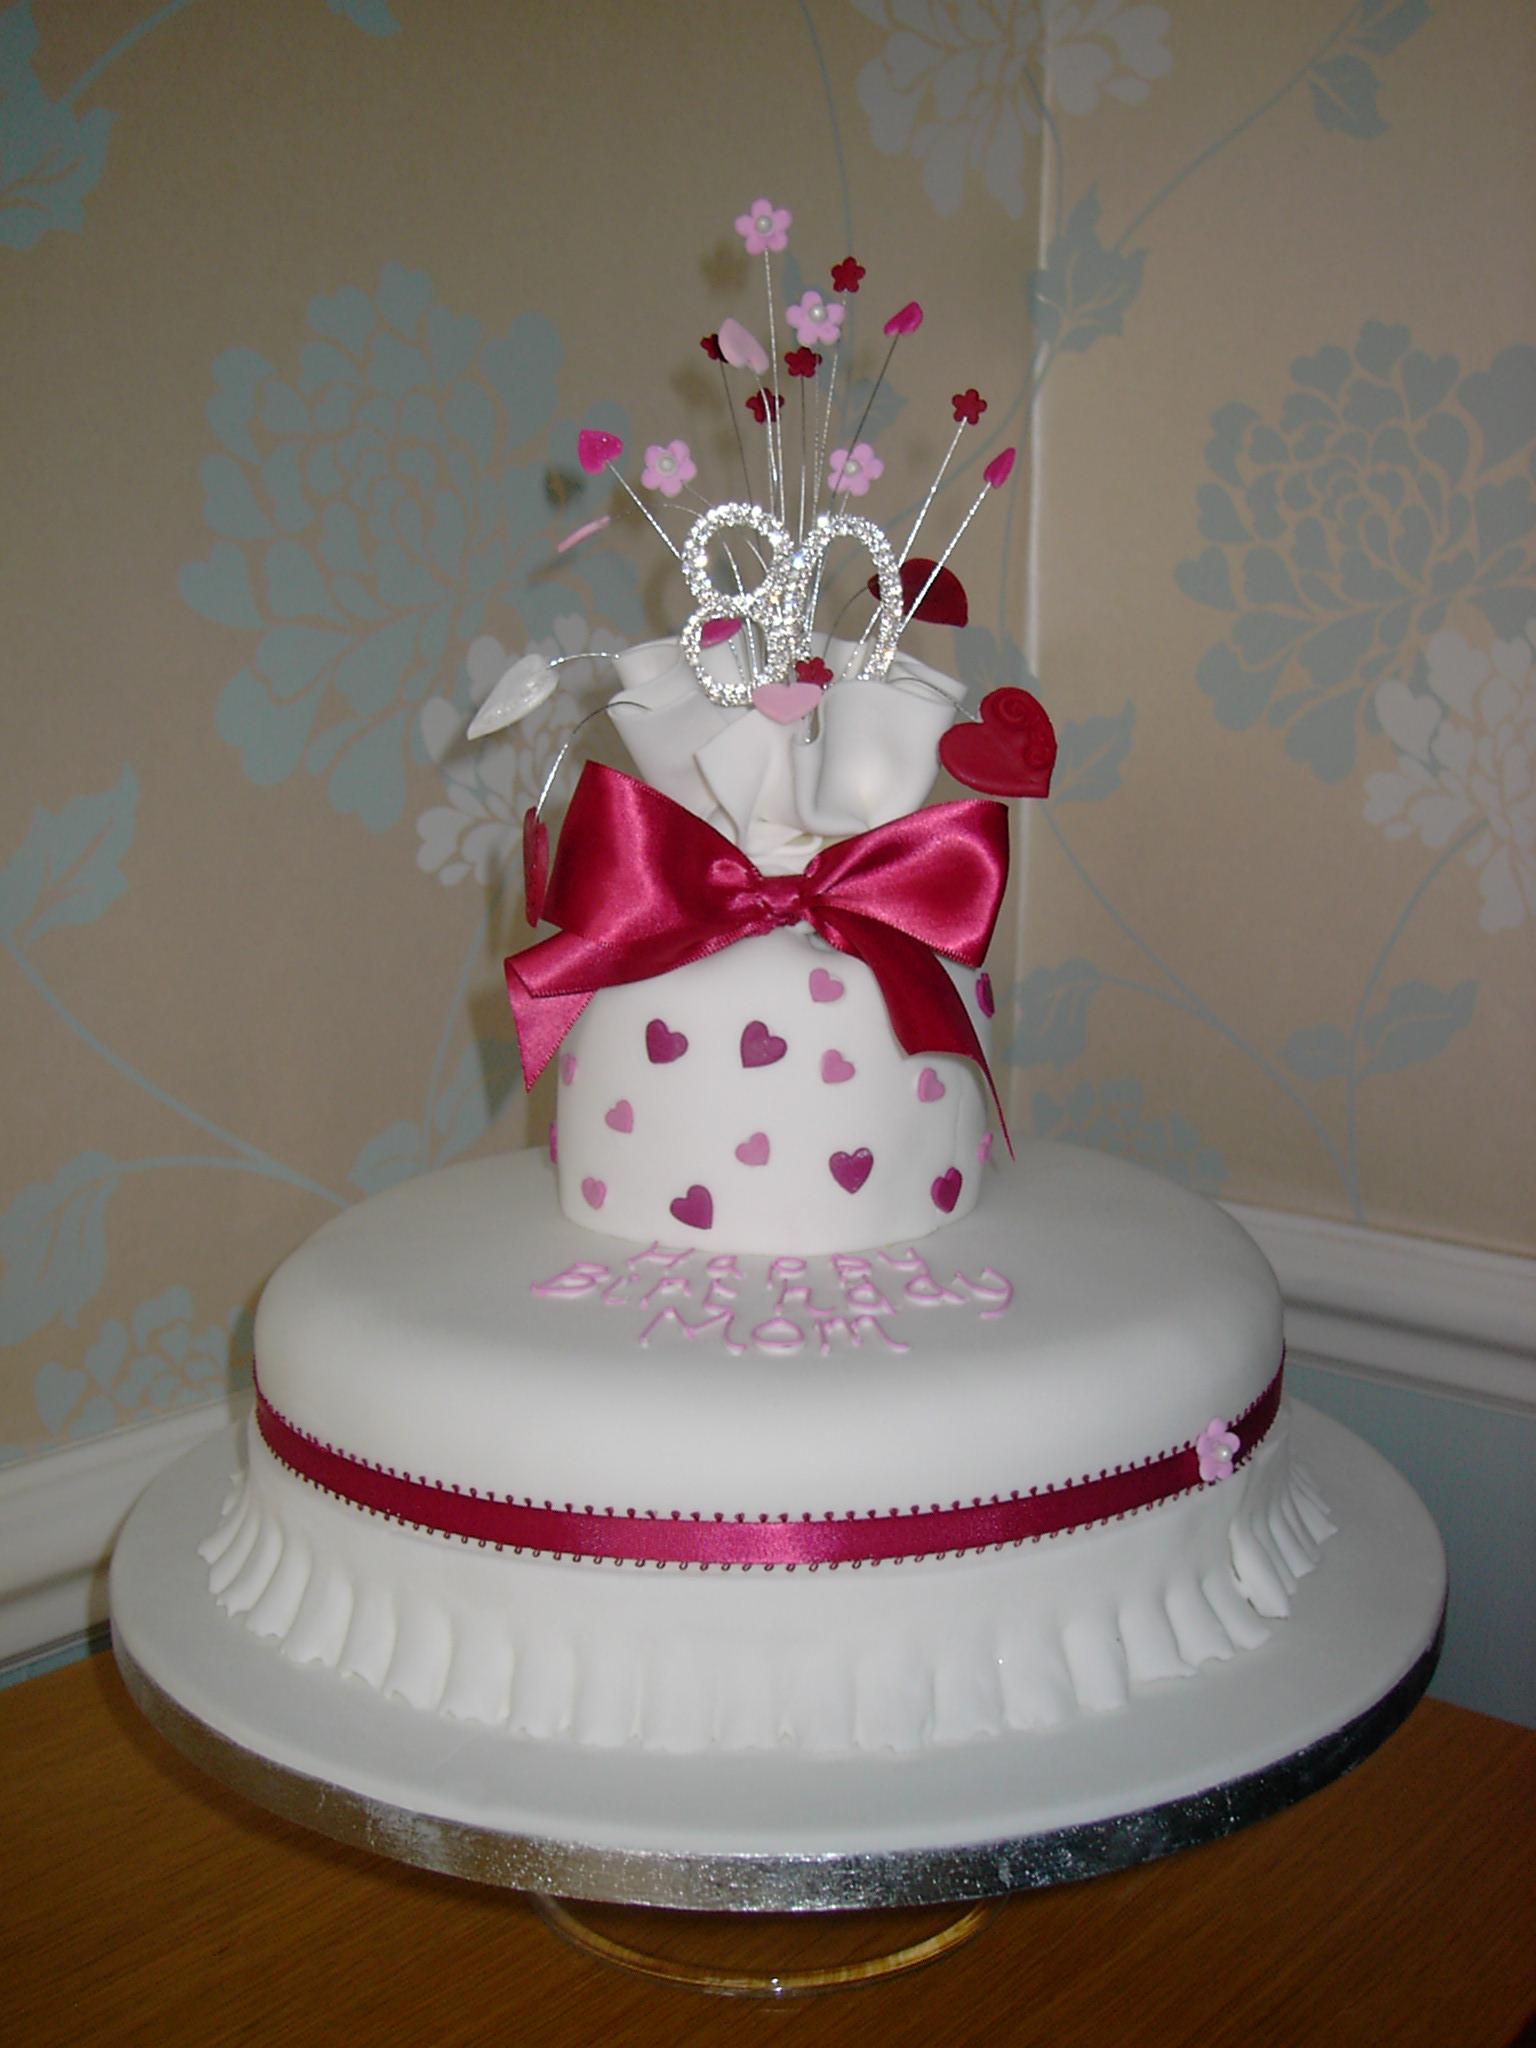 Ough What a Cake 2 Birthdays